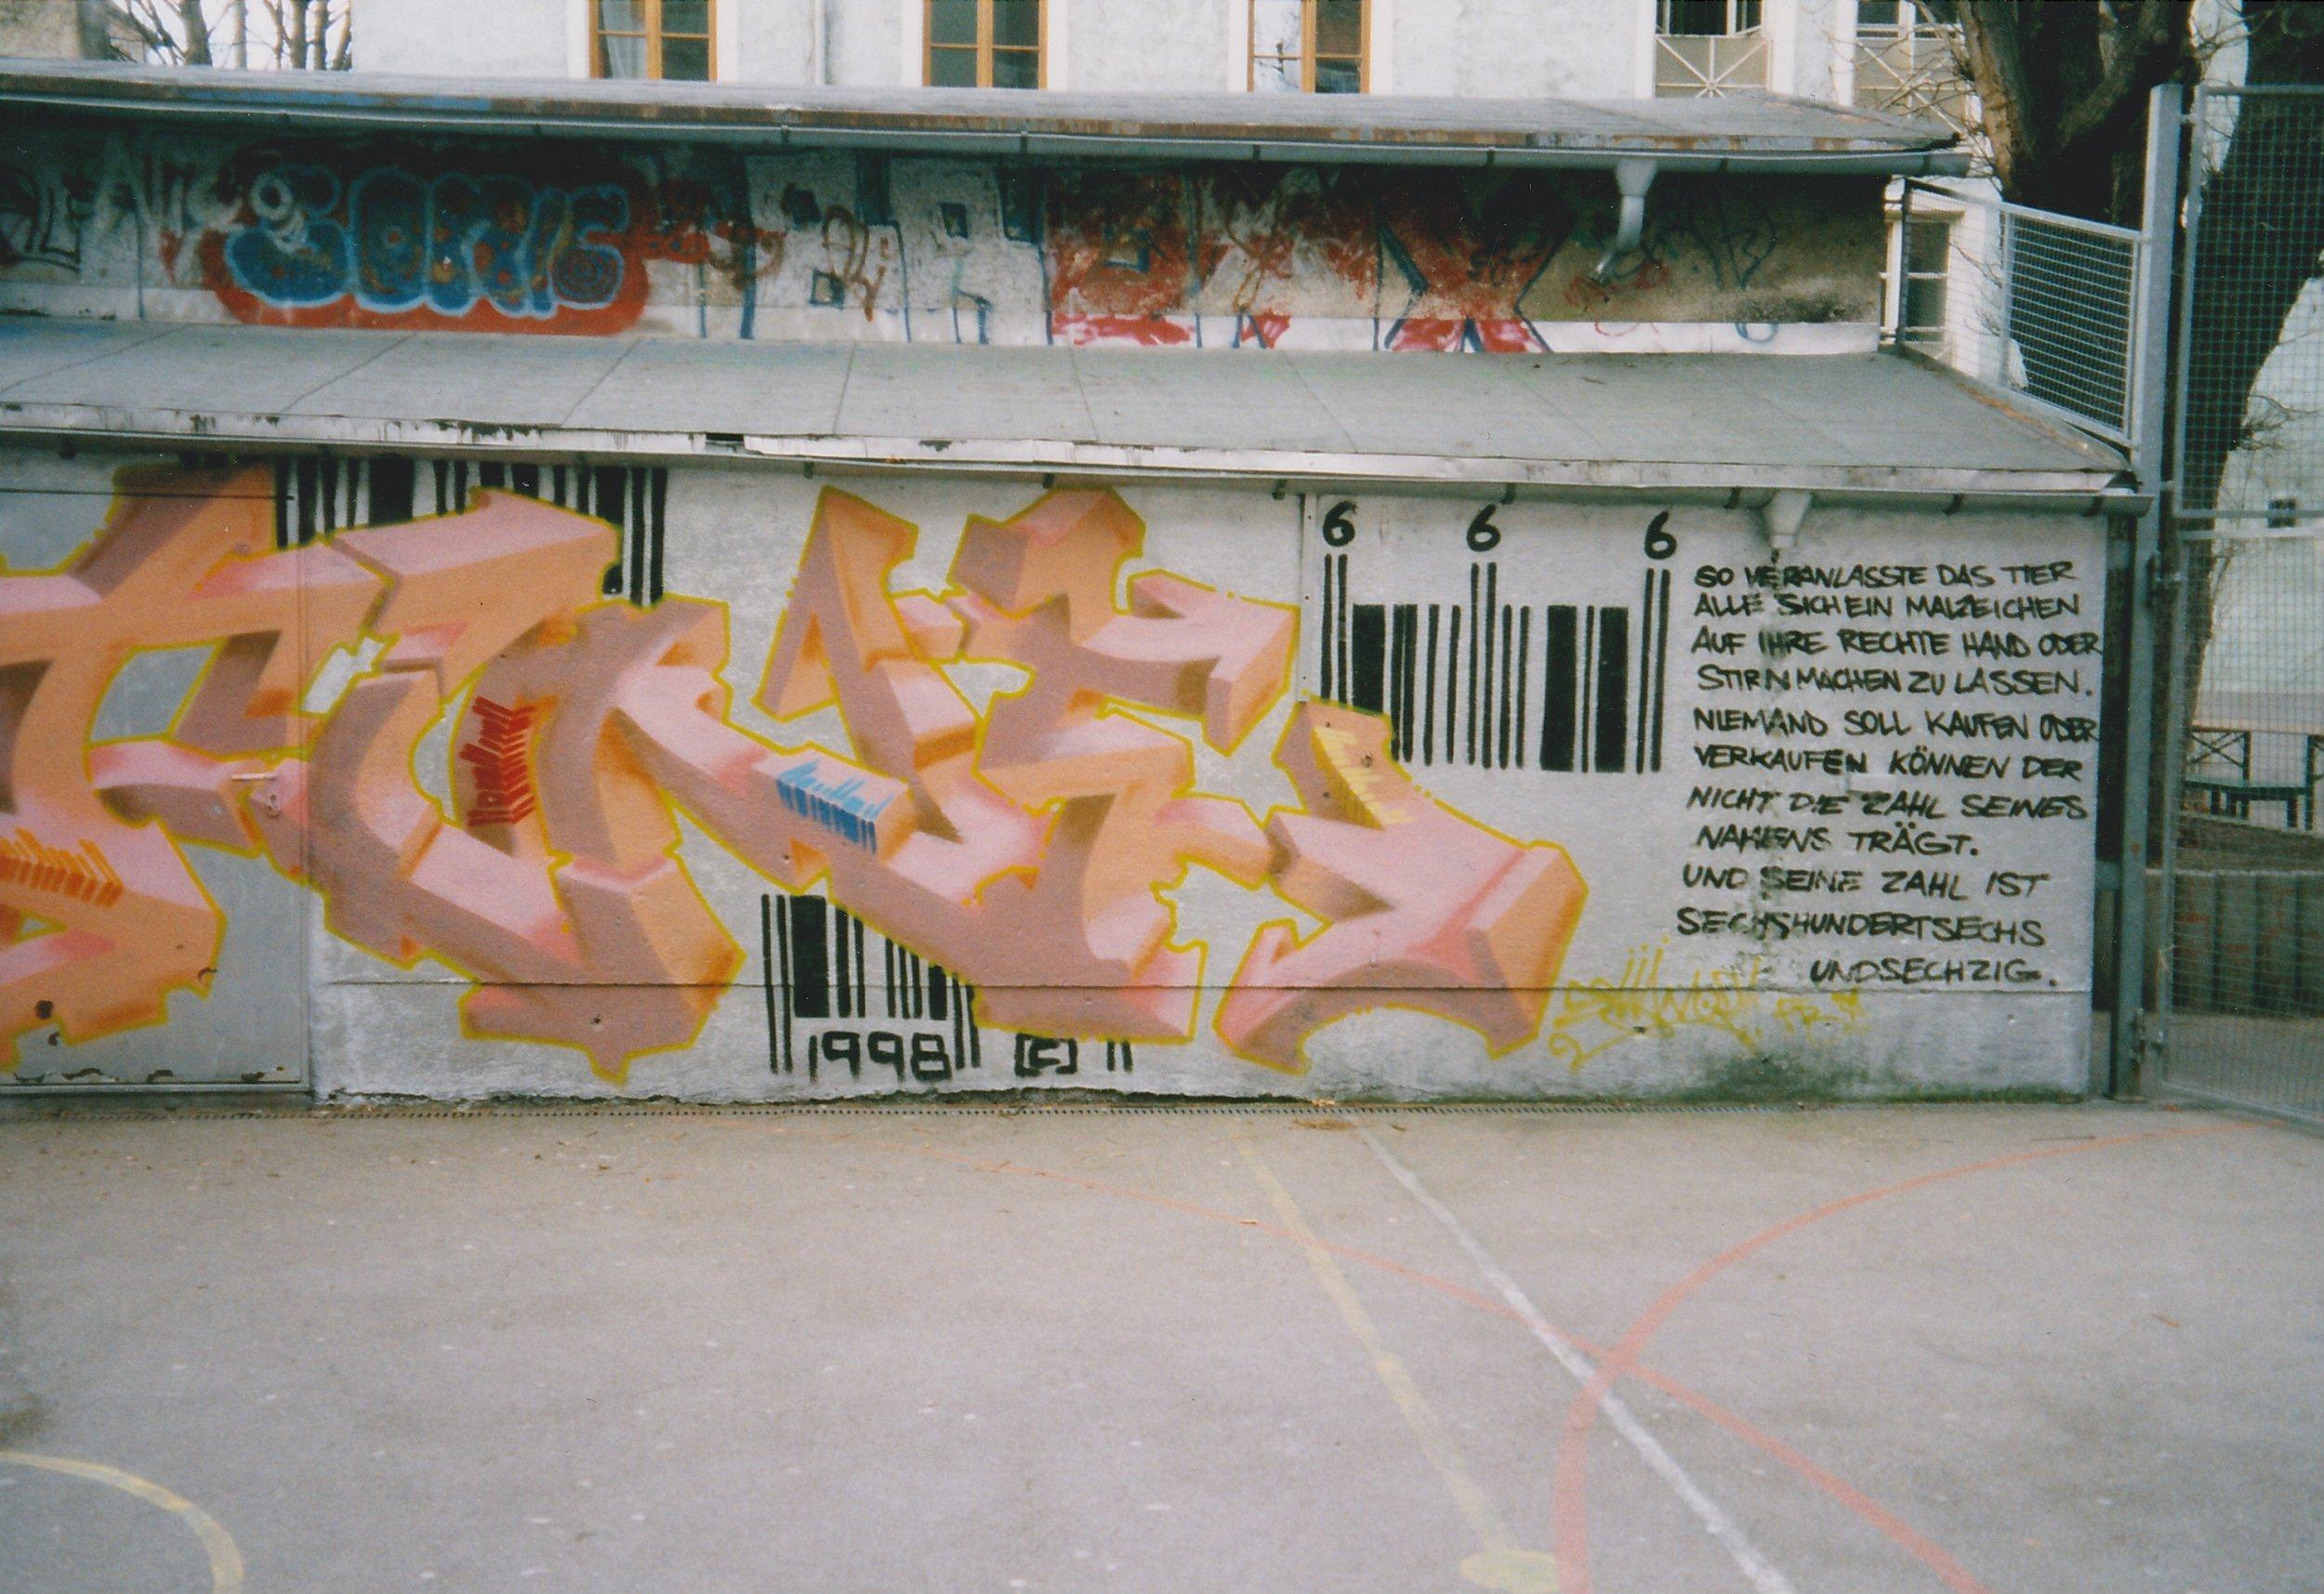 Glocke unbekannt Graffiti Barcode 1.jpg